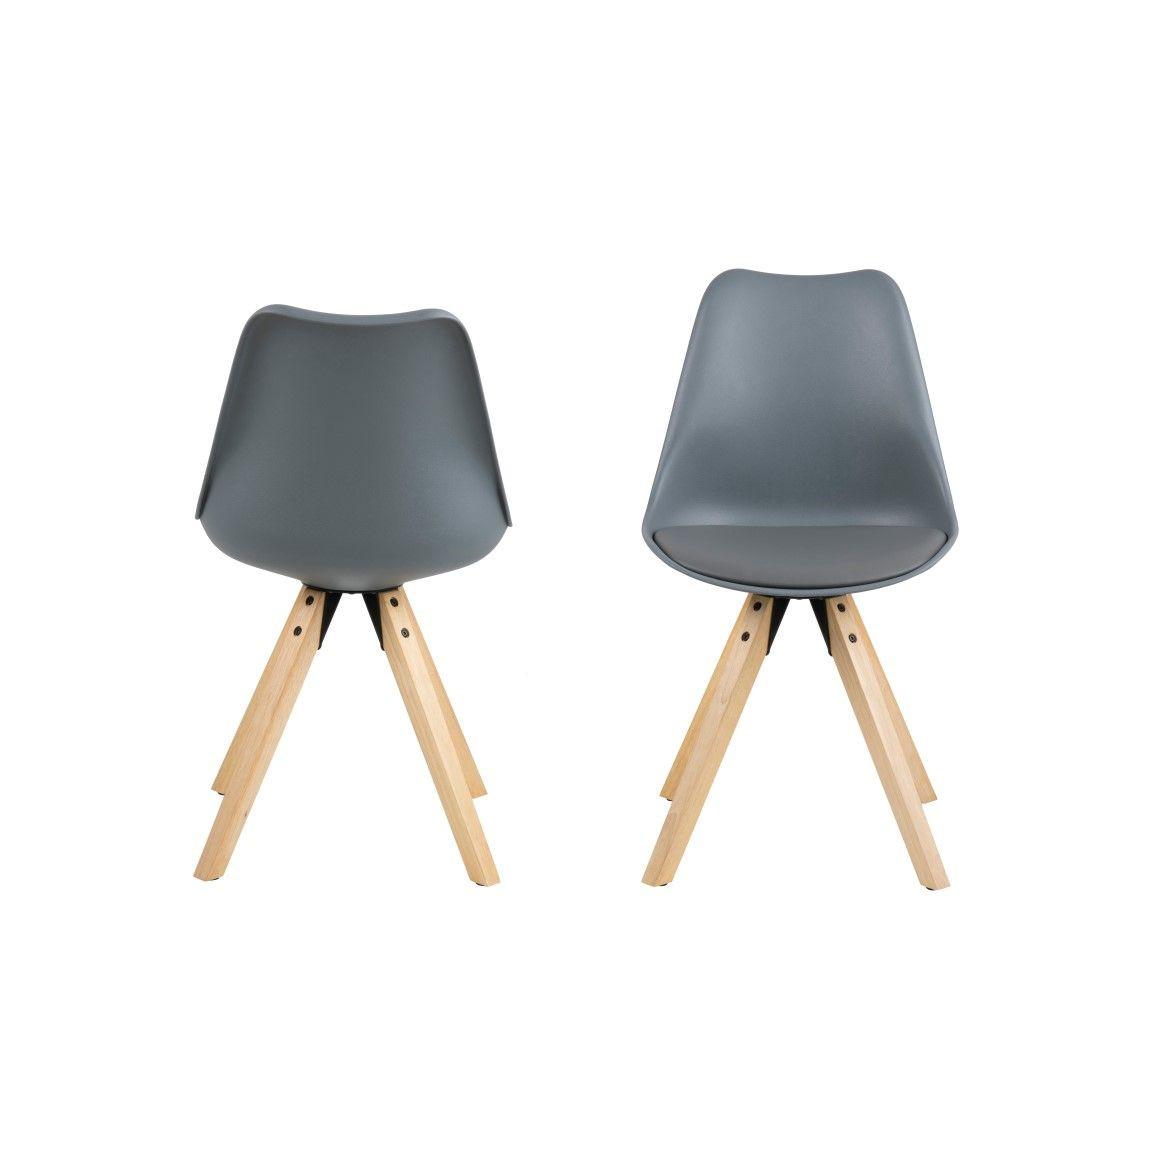 Chairs Nida Set of 2 | Grey + Grey Cushion